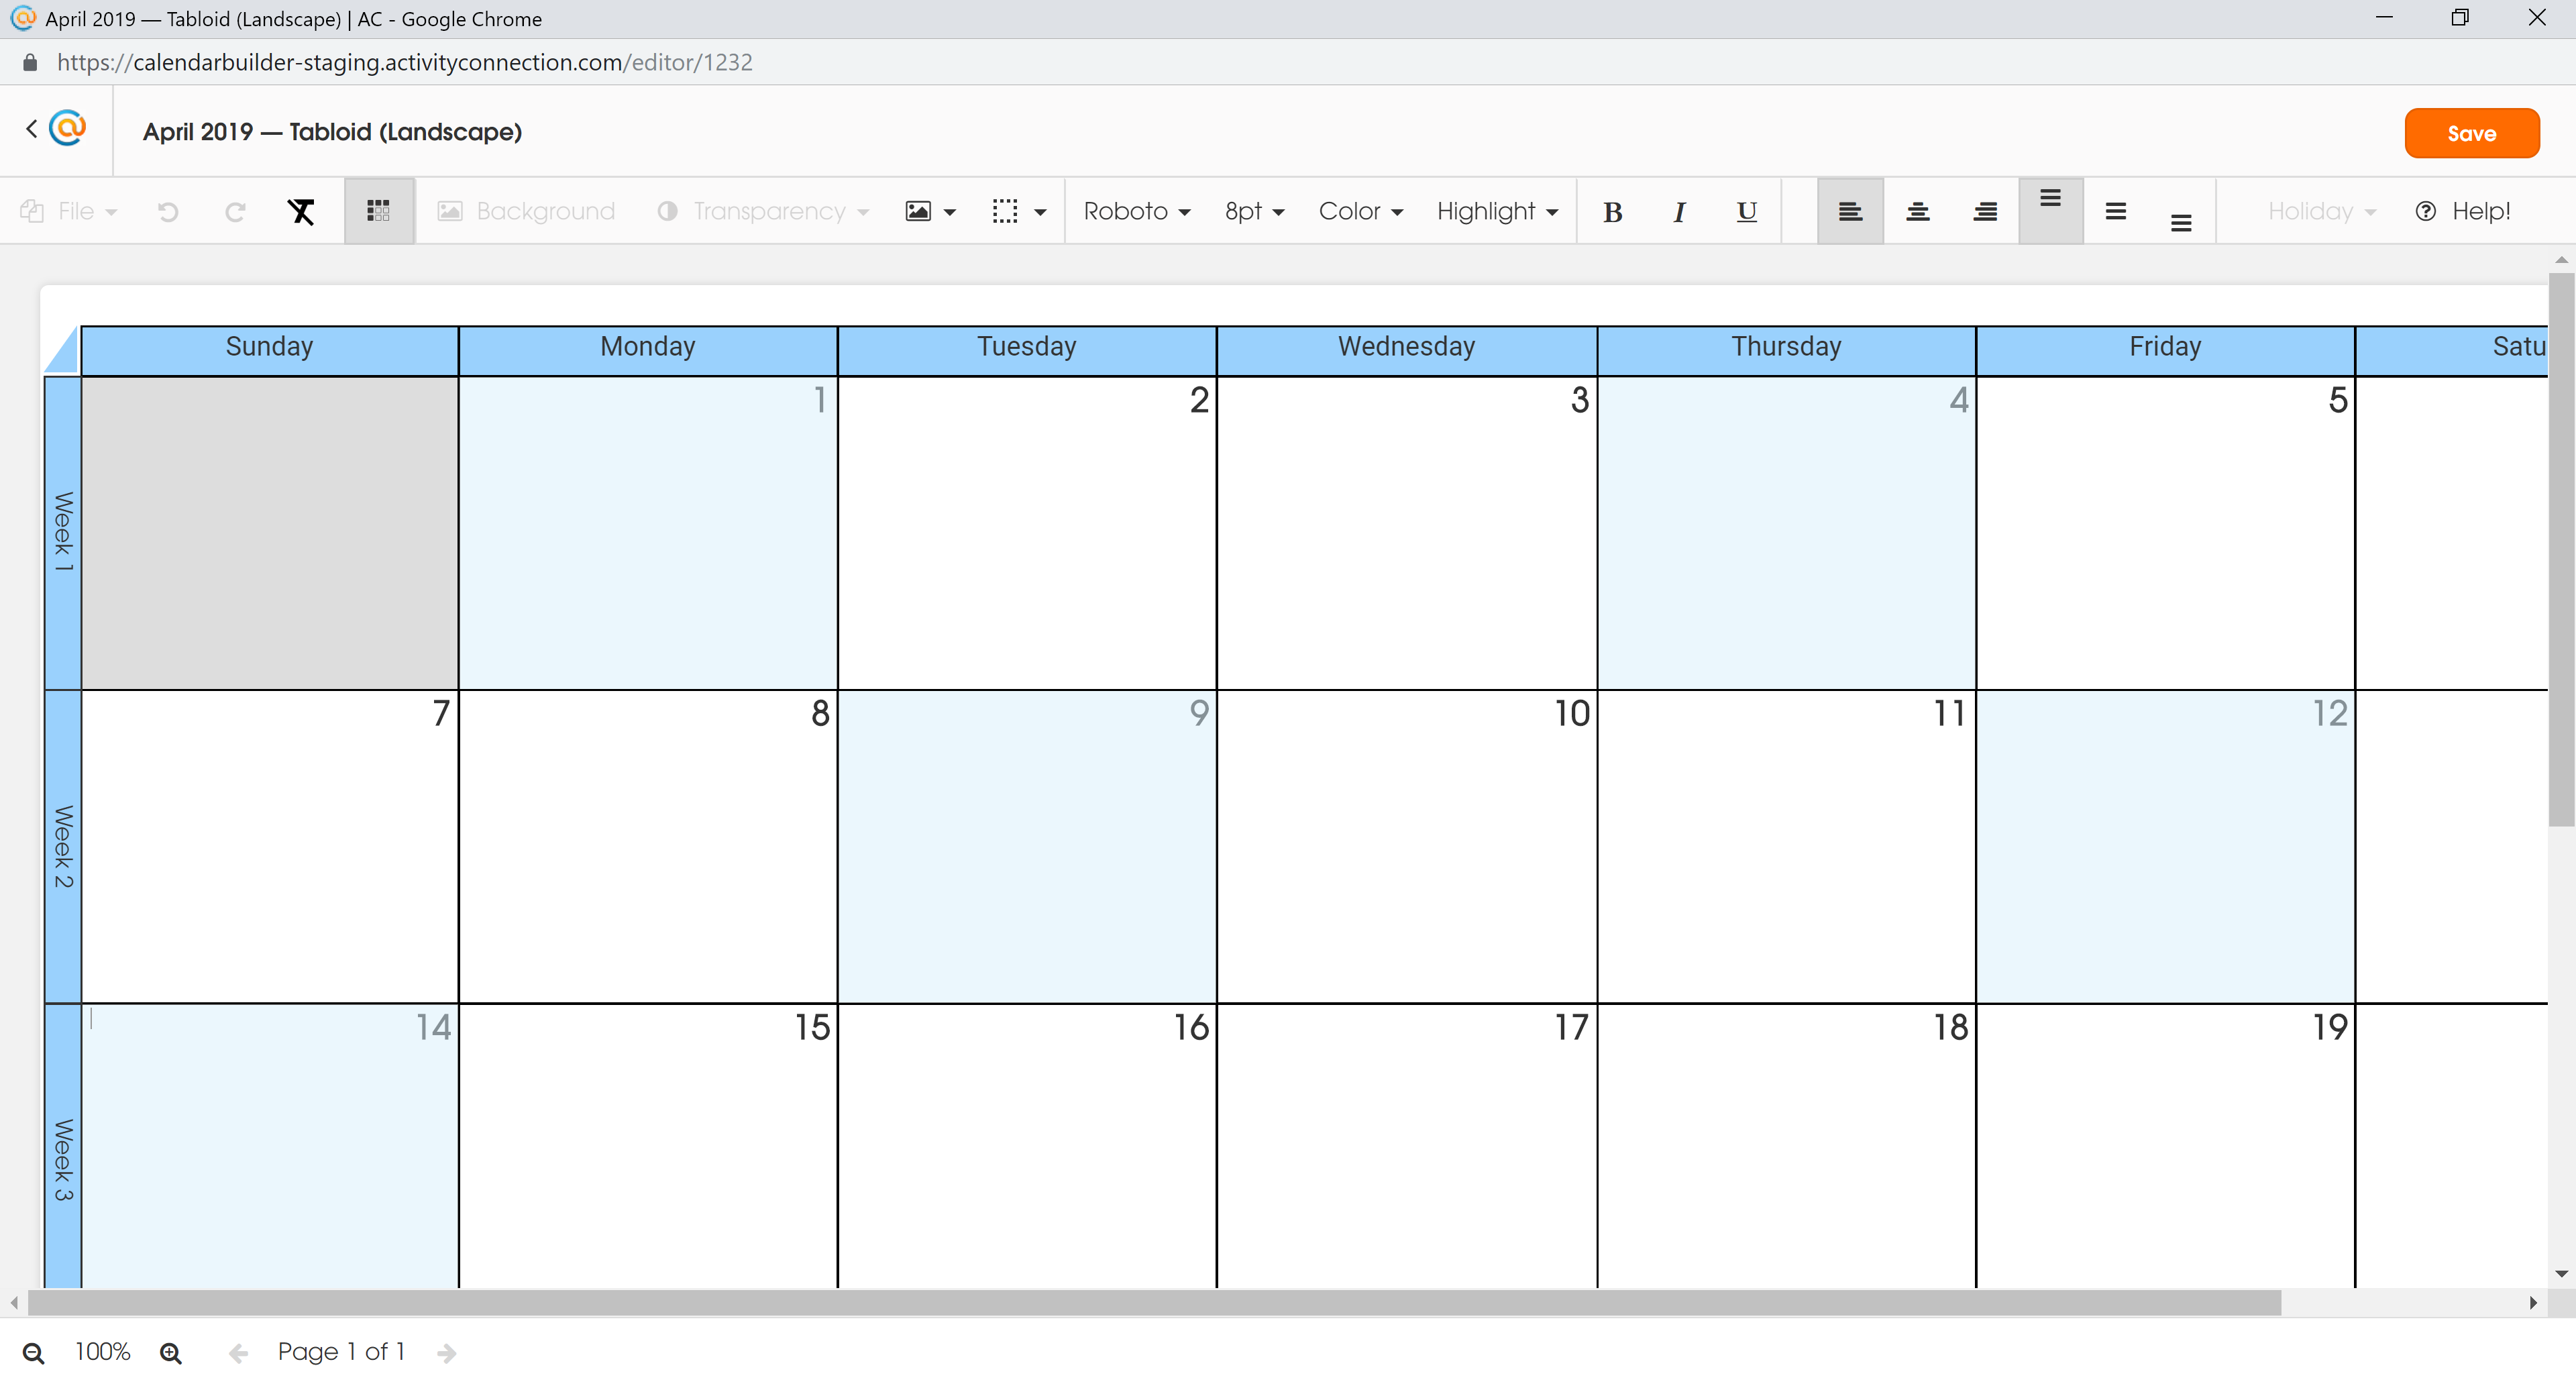 Calendar - Random Selected